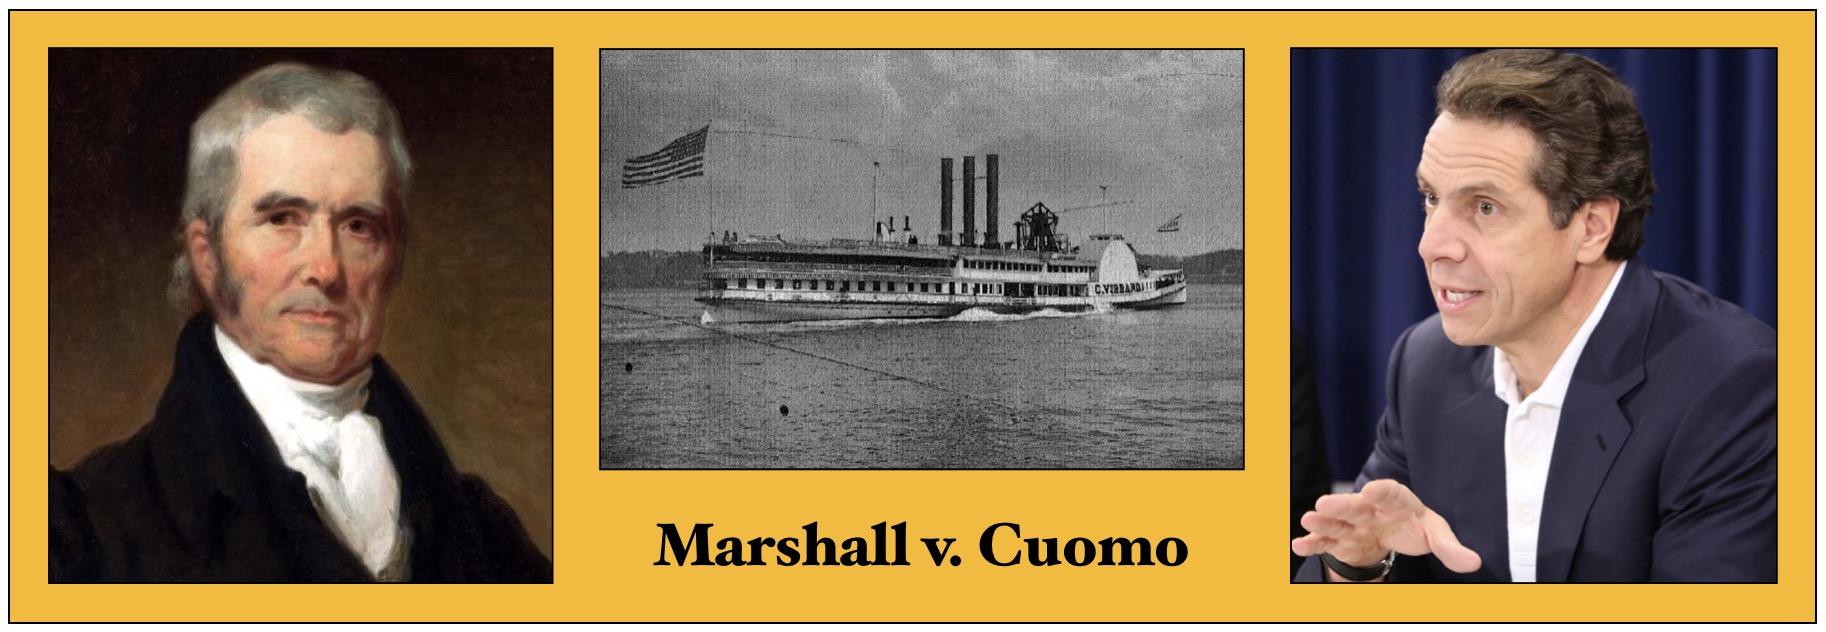 Steamboat trip